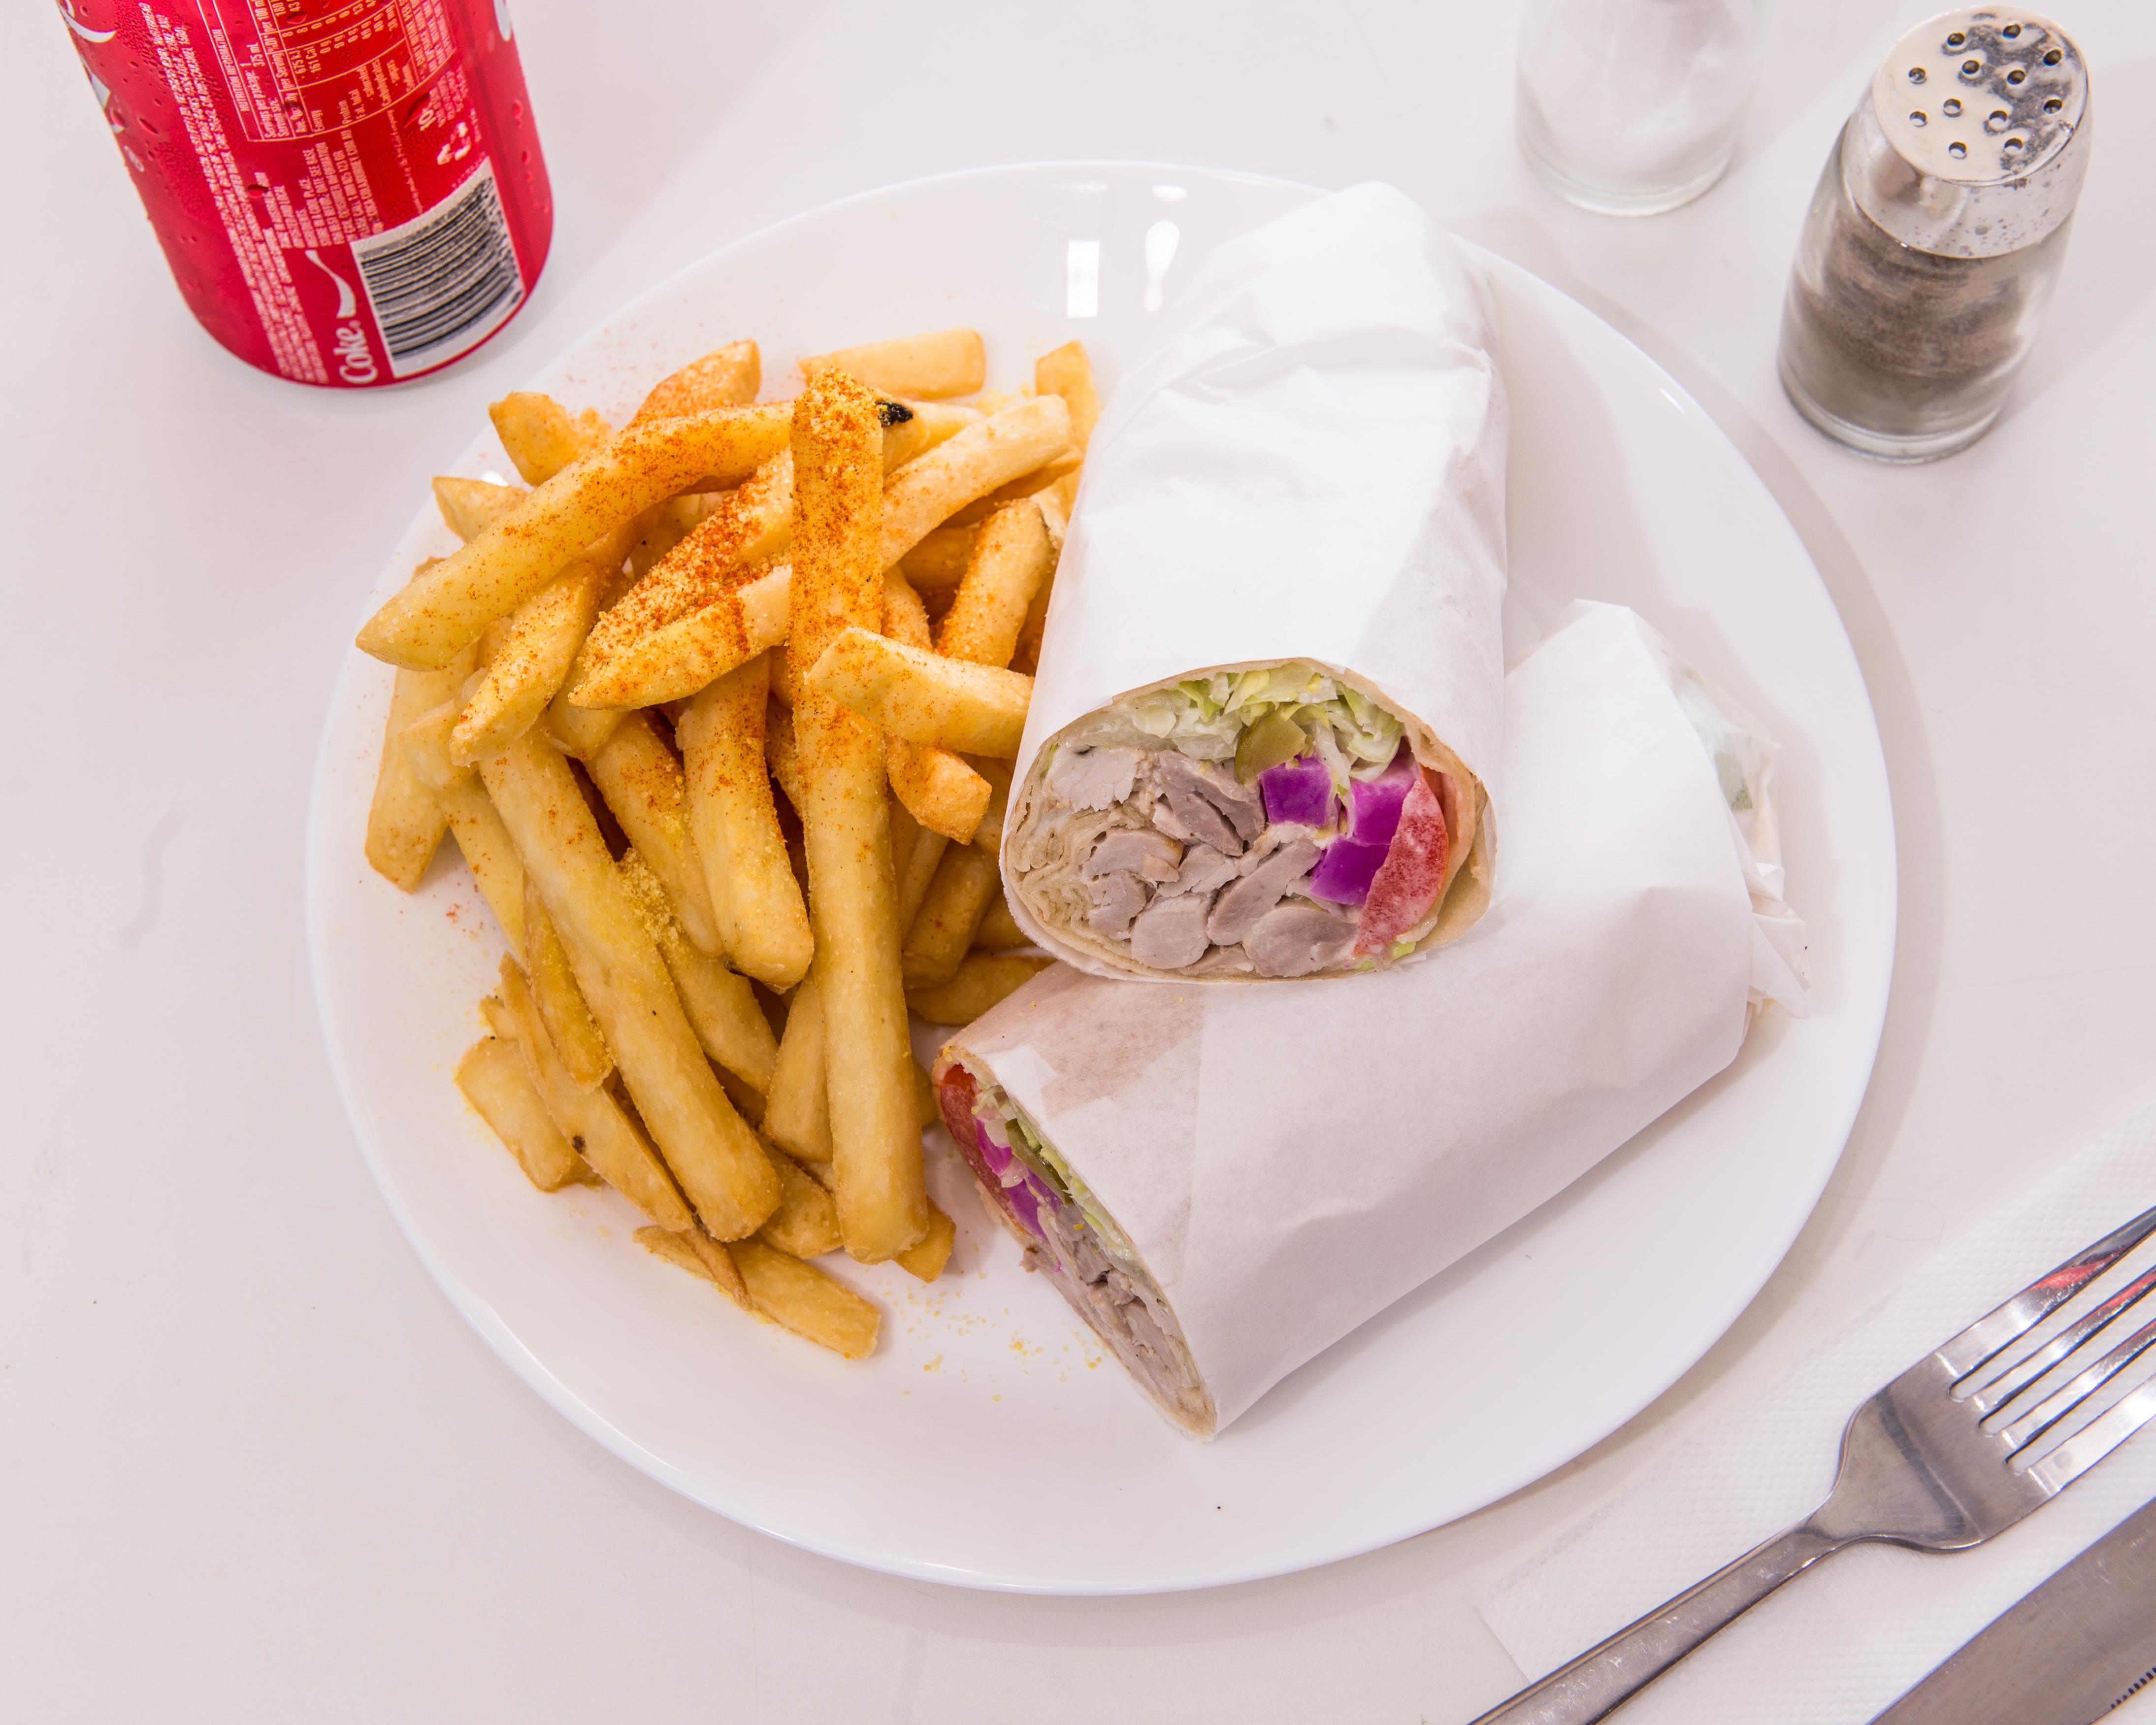 ChickenHeavenCharcoalChicken&LebaneseCuisine_ChickenRollMeal_native